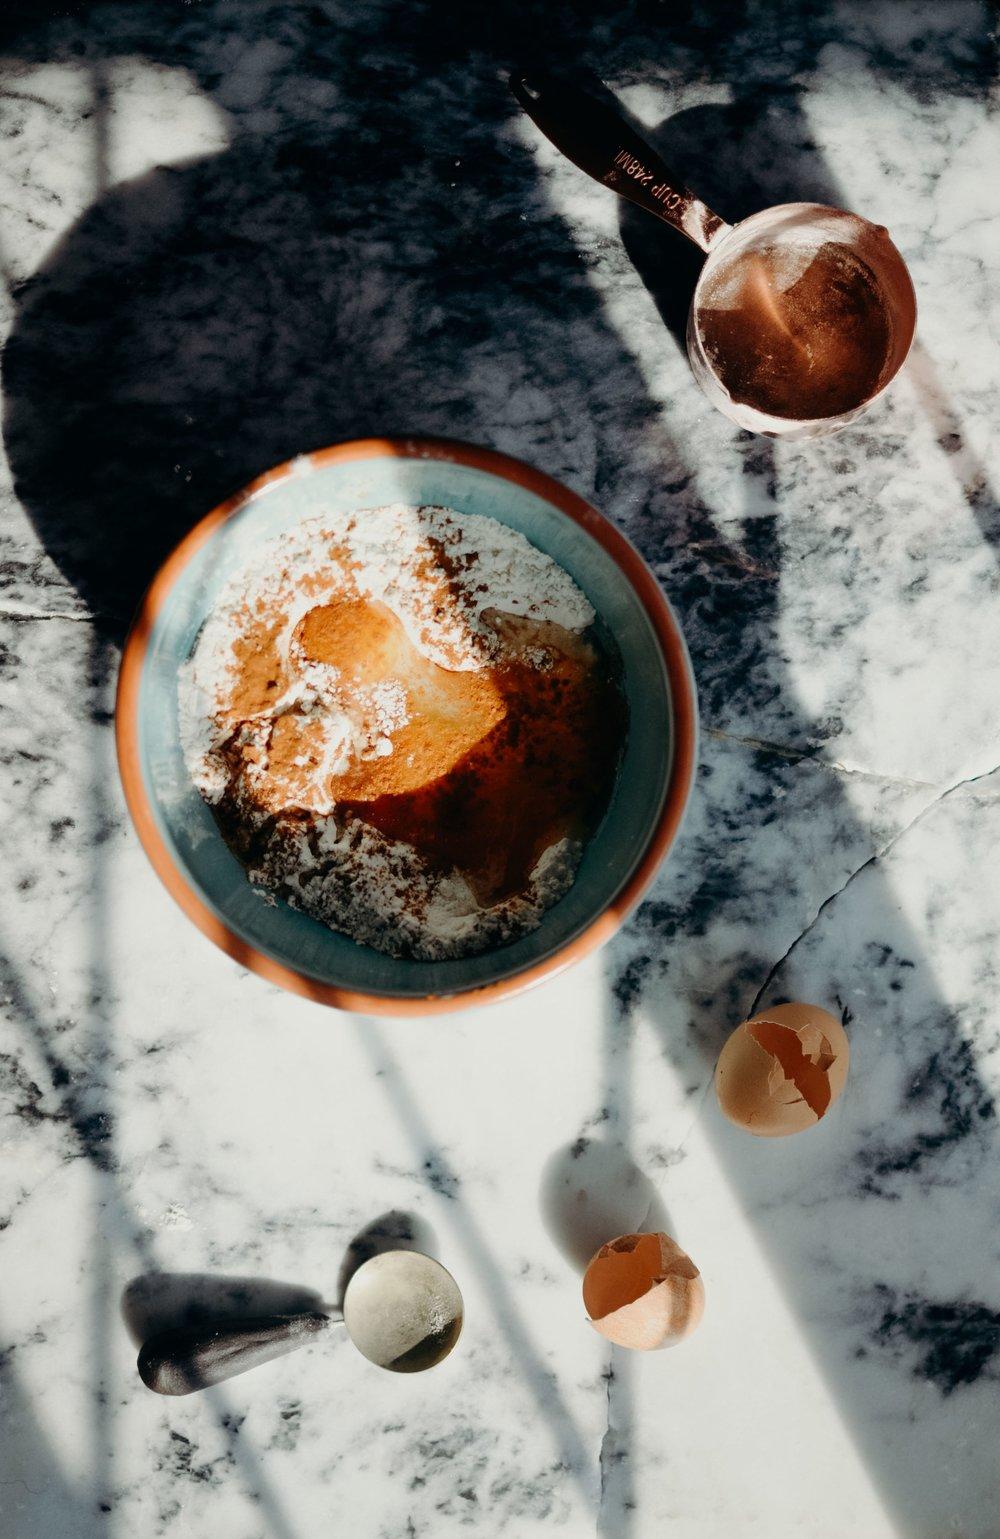 Wendling_Boyd_Moose_Shaped_Buffalo_Butter_Pancakes_Recipe-5.jpg